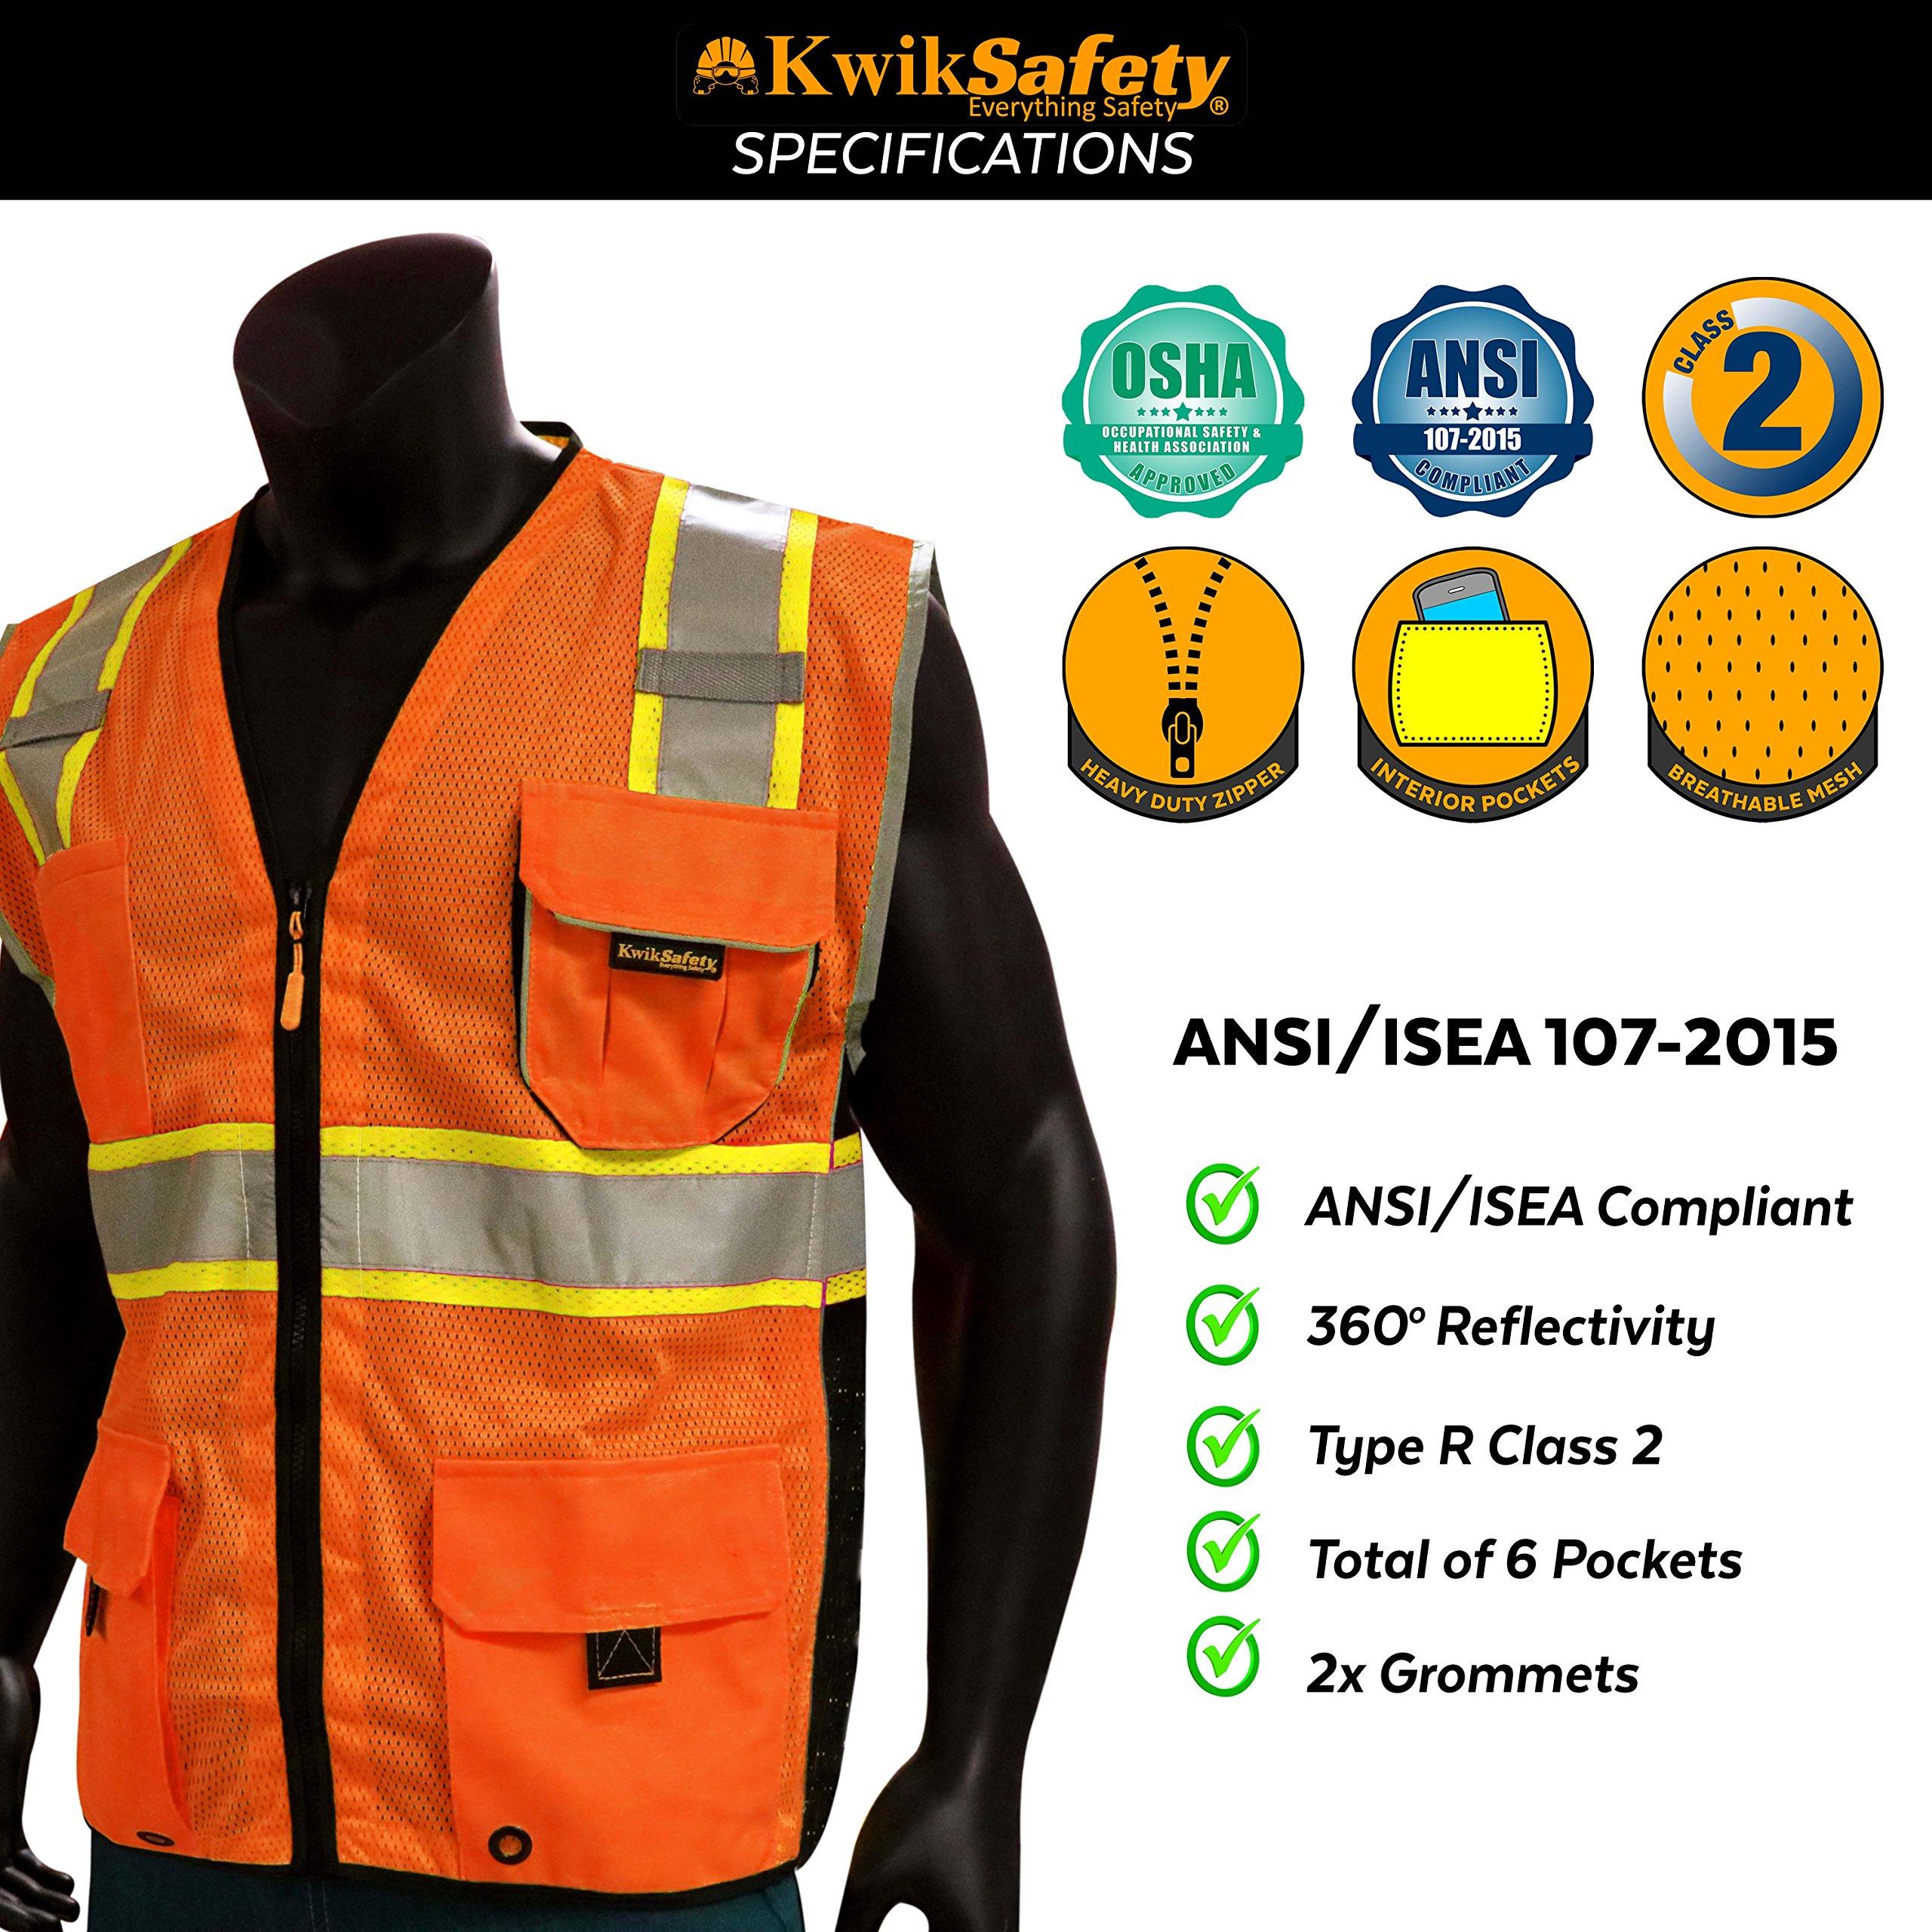 KwikSafety CLASSIC Safety Vest | Class 2 ANSI OSHA PPE | High Visibility Reflective Stripes, Heavy Duty Mesh with Pockets and Zipper | Hi-Vis Construction Work Hi-Vis Surveyor | Orange S/M by KwikSafety (Image #6)